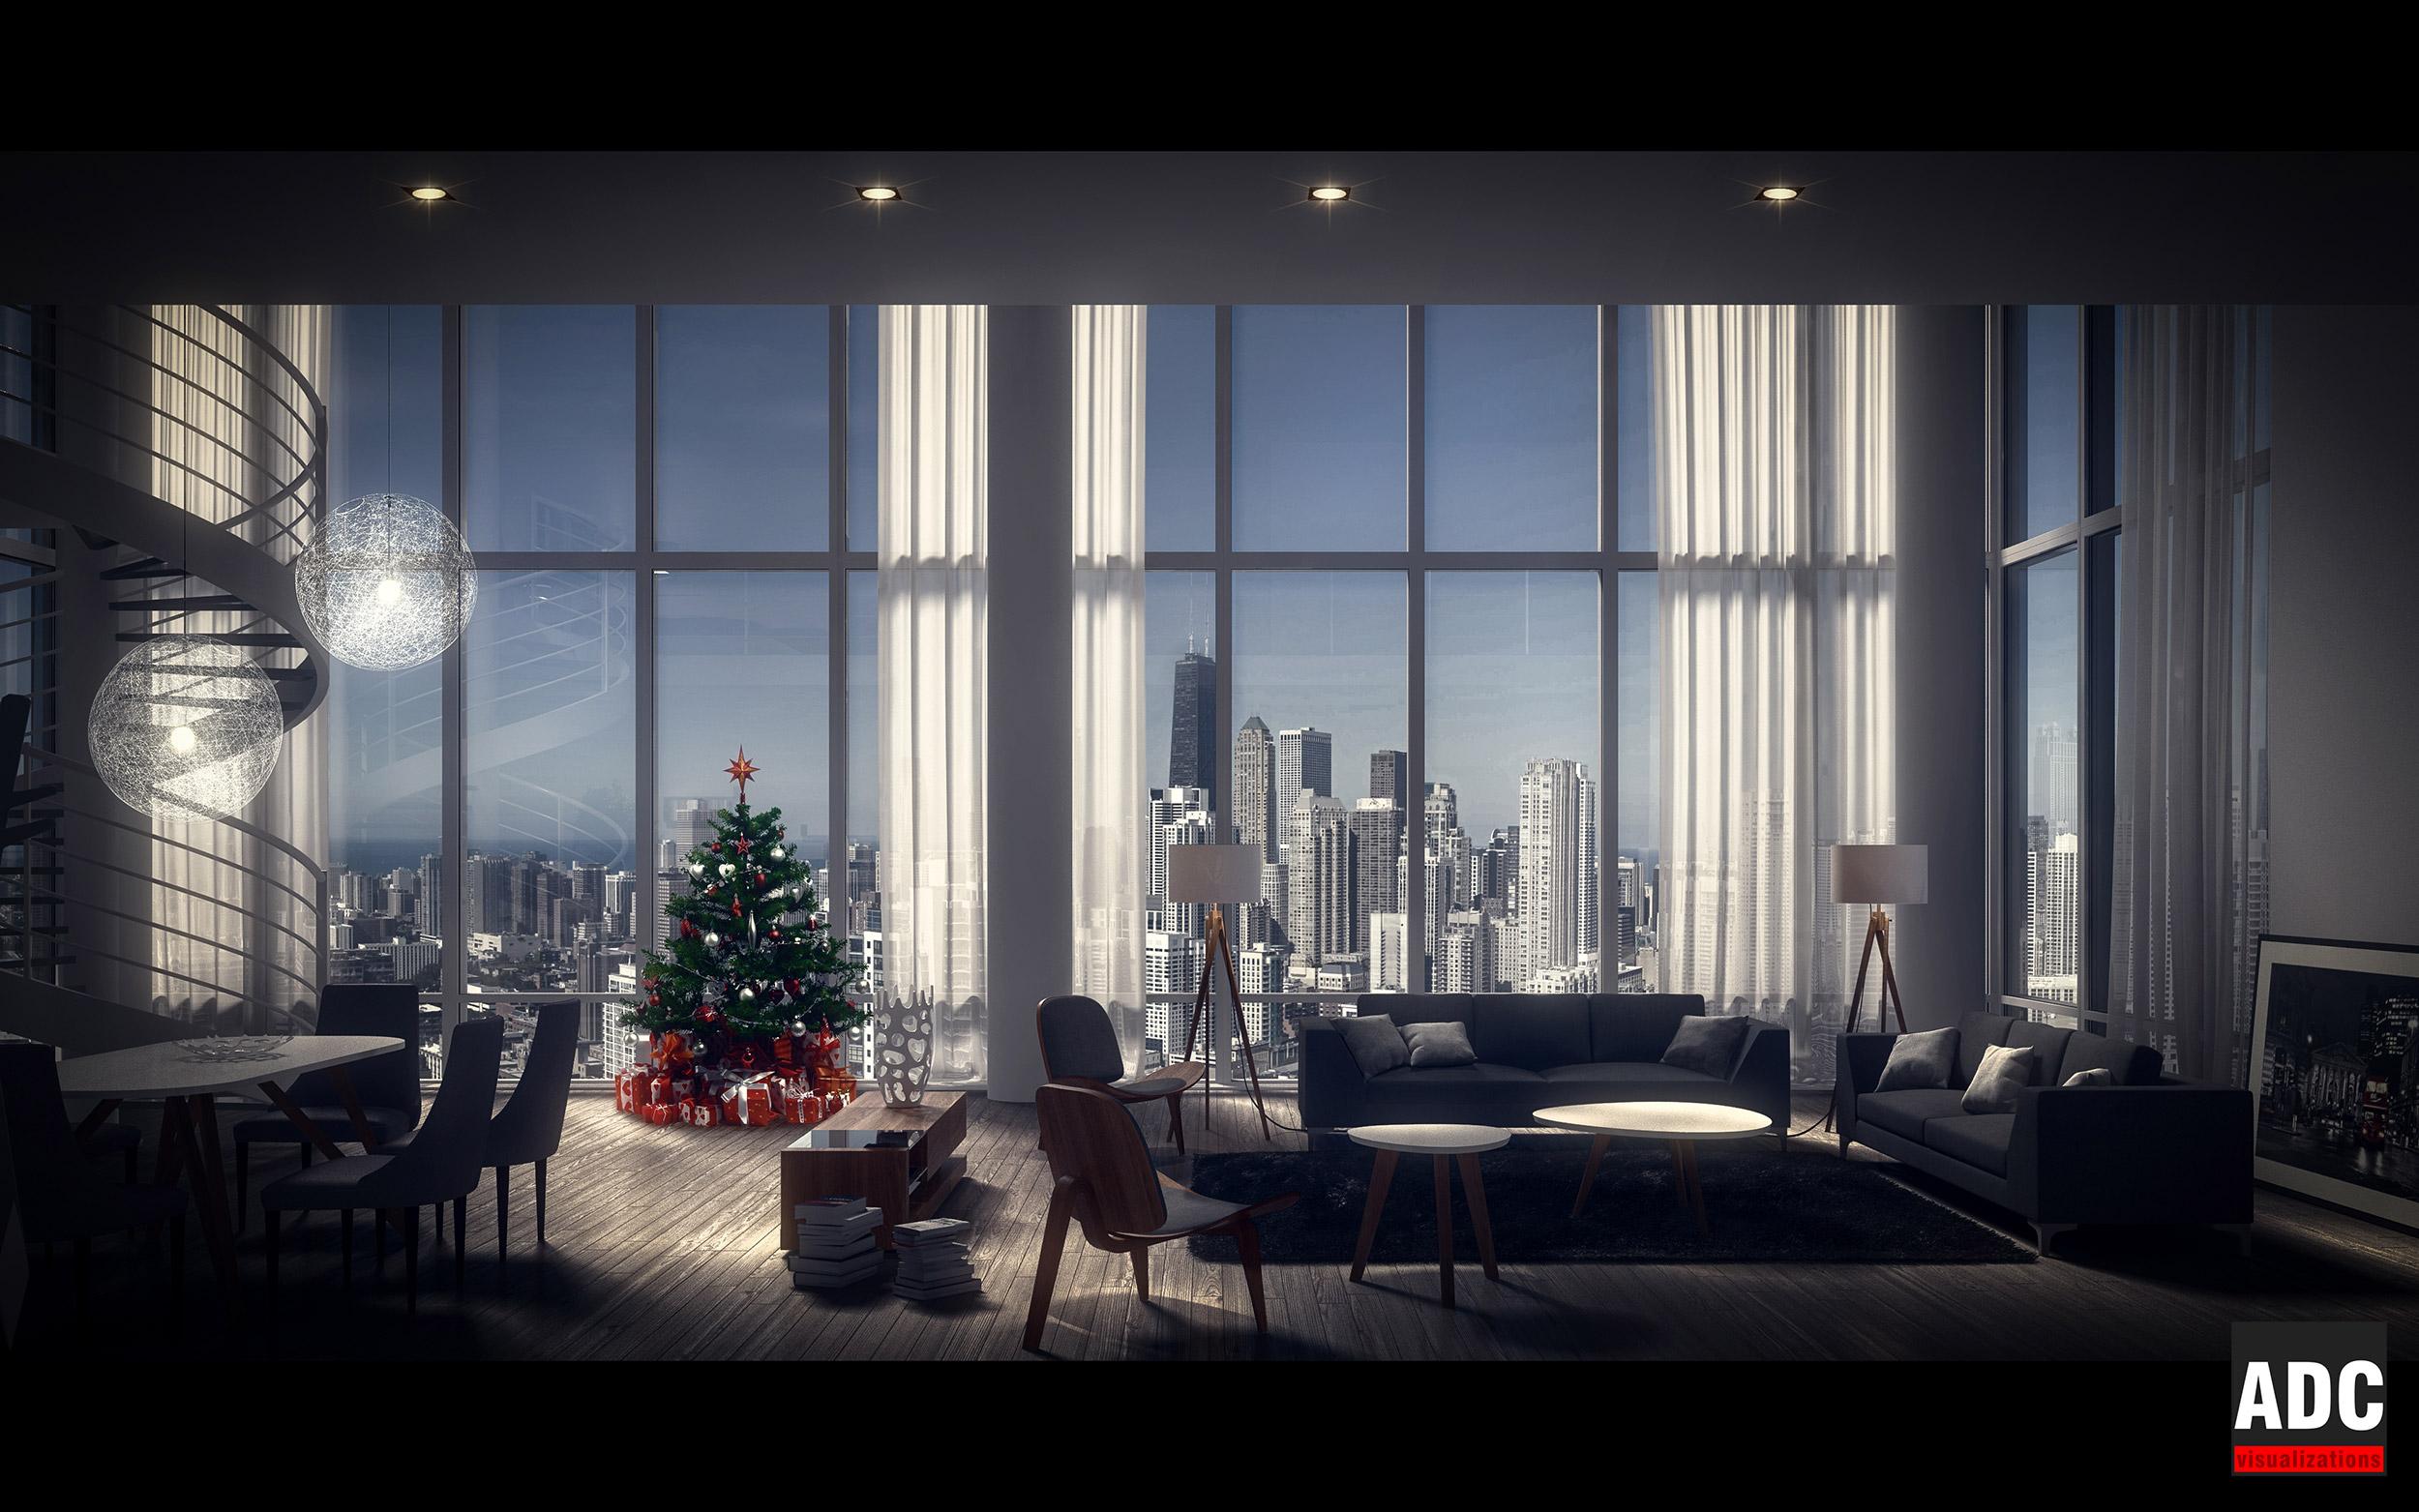 christmas_lres.jpg